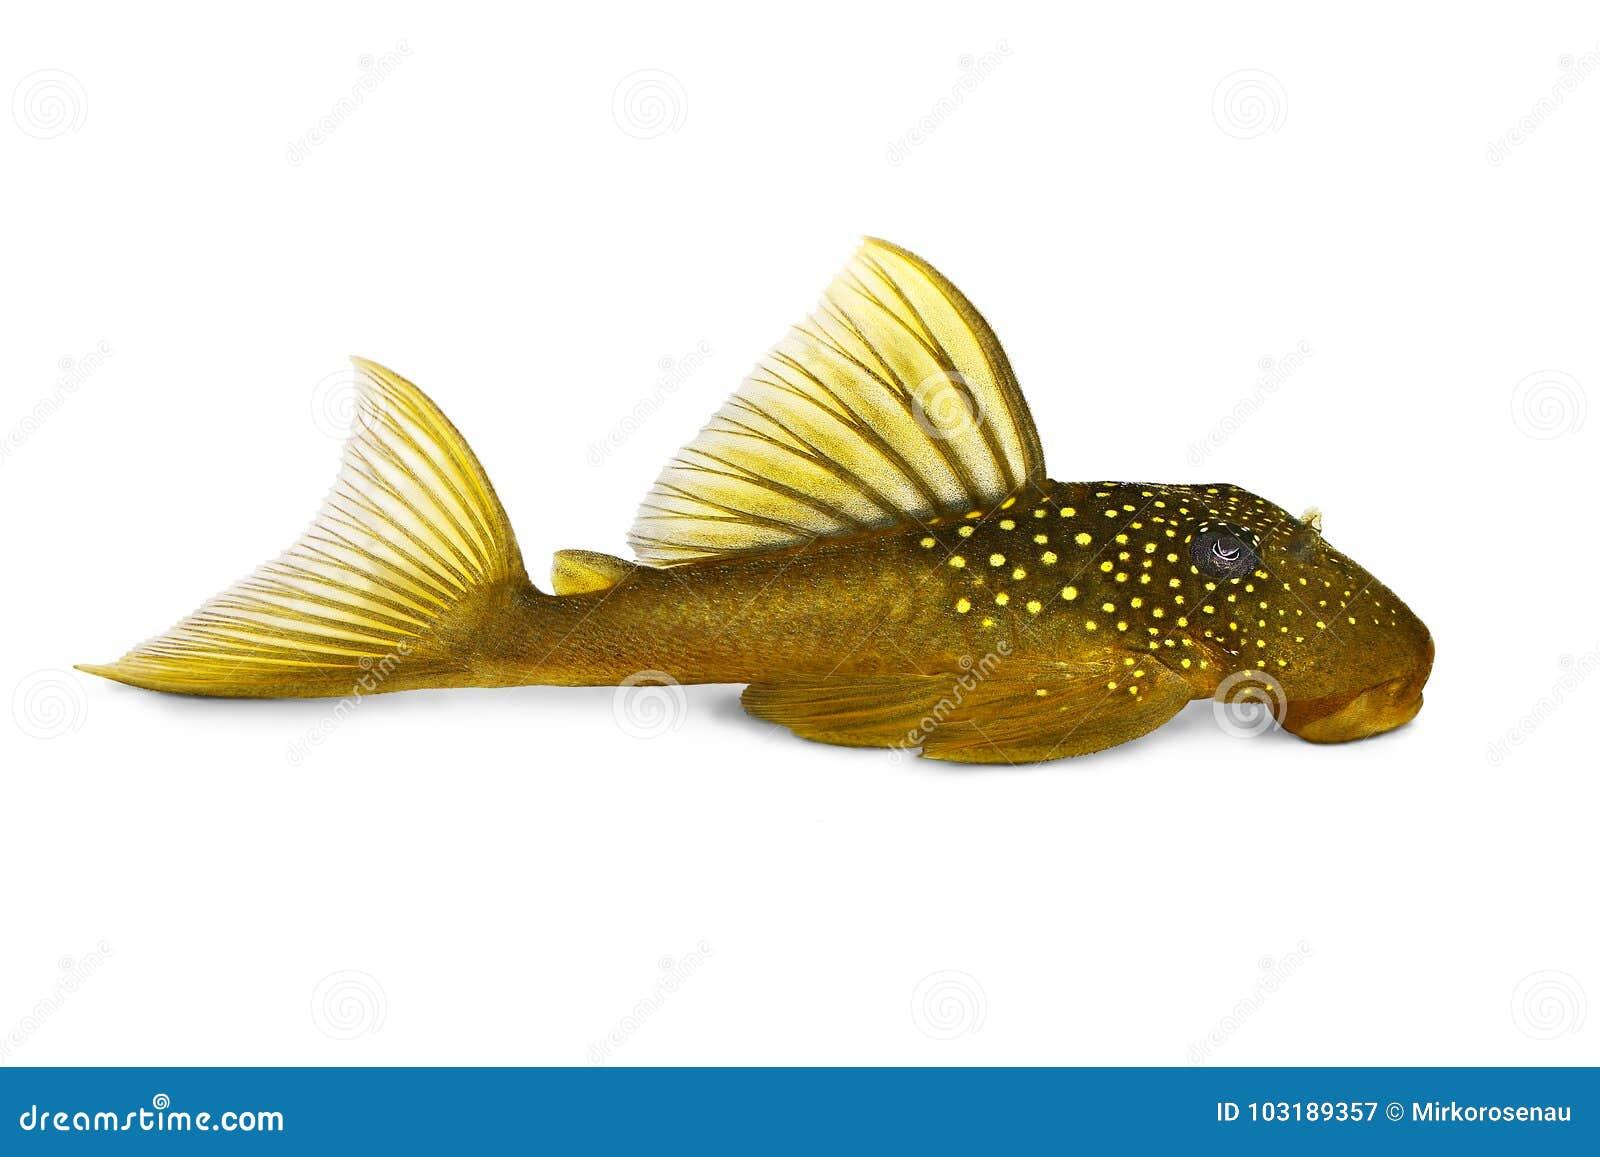 Grüne Phantom-pleco L200 Hemiancistrus subviridis Aquariumfische